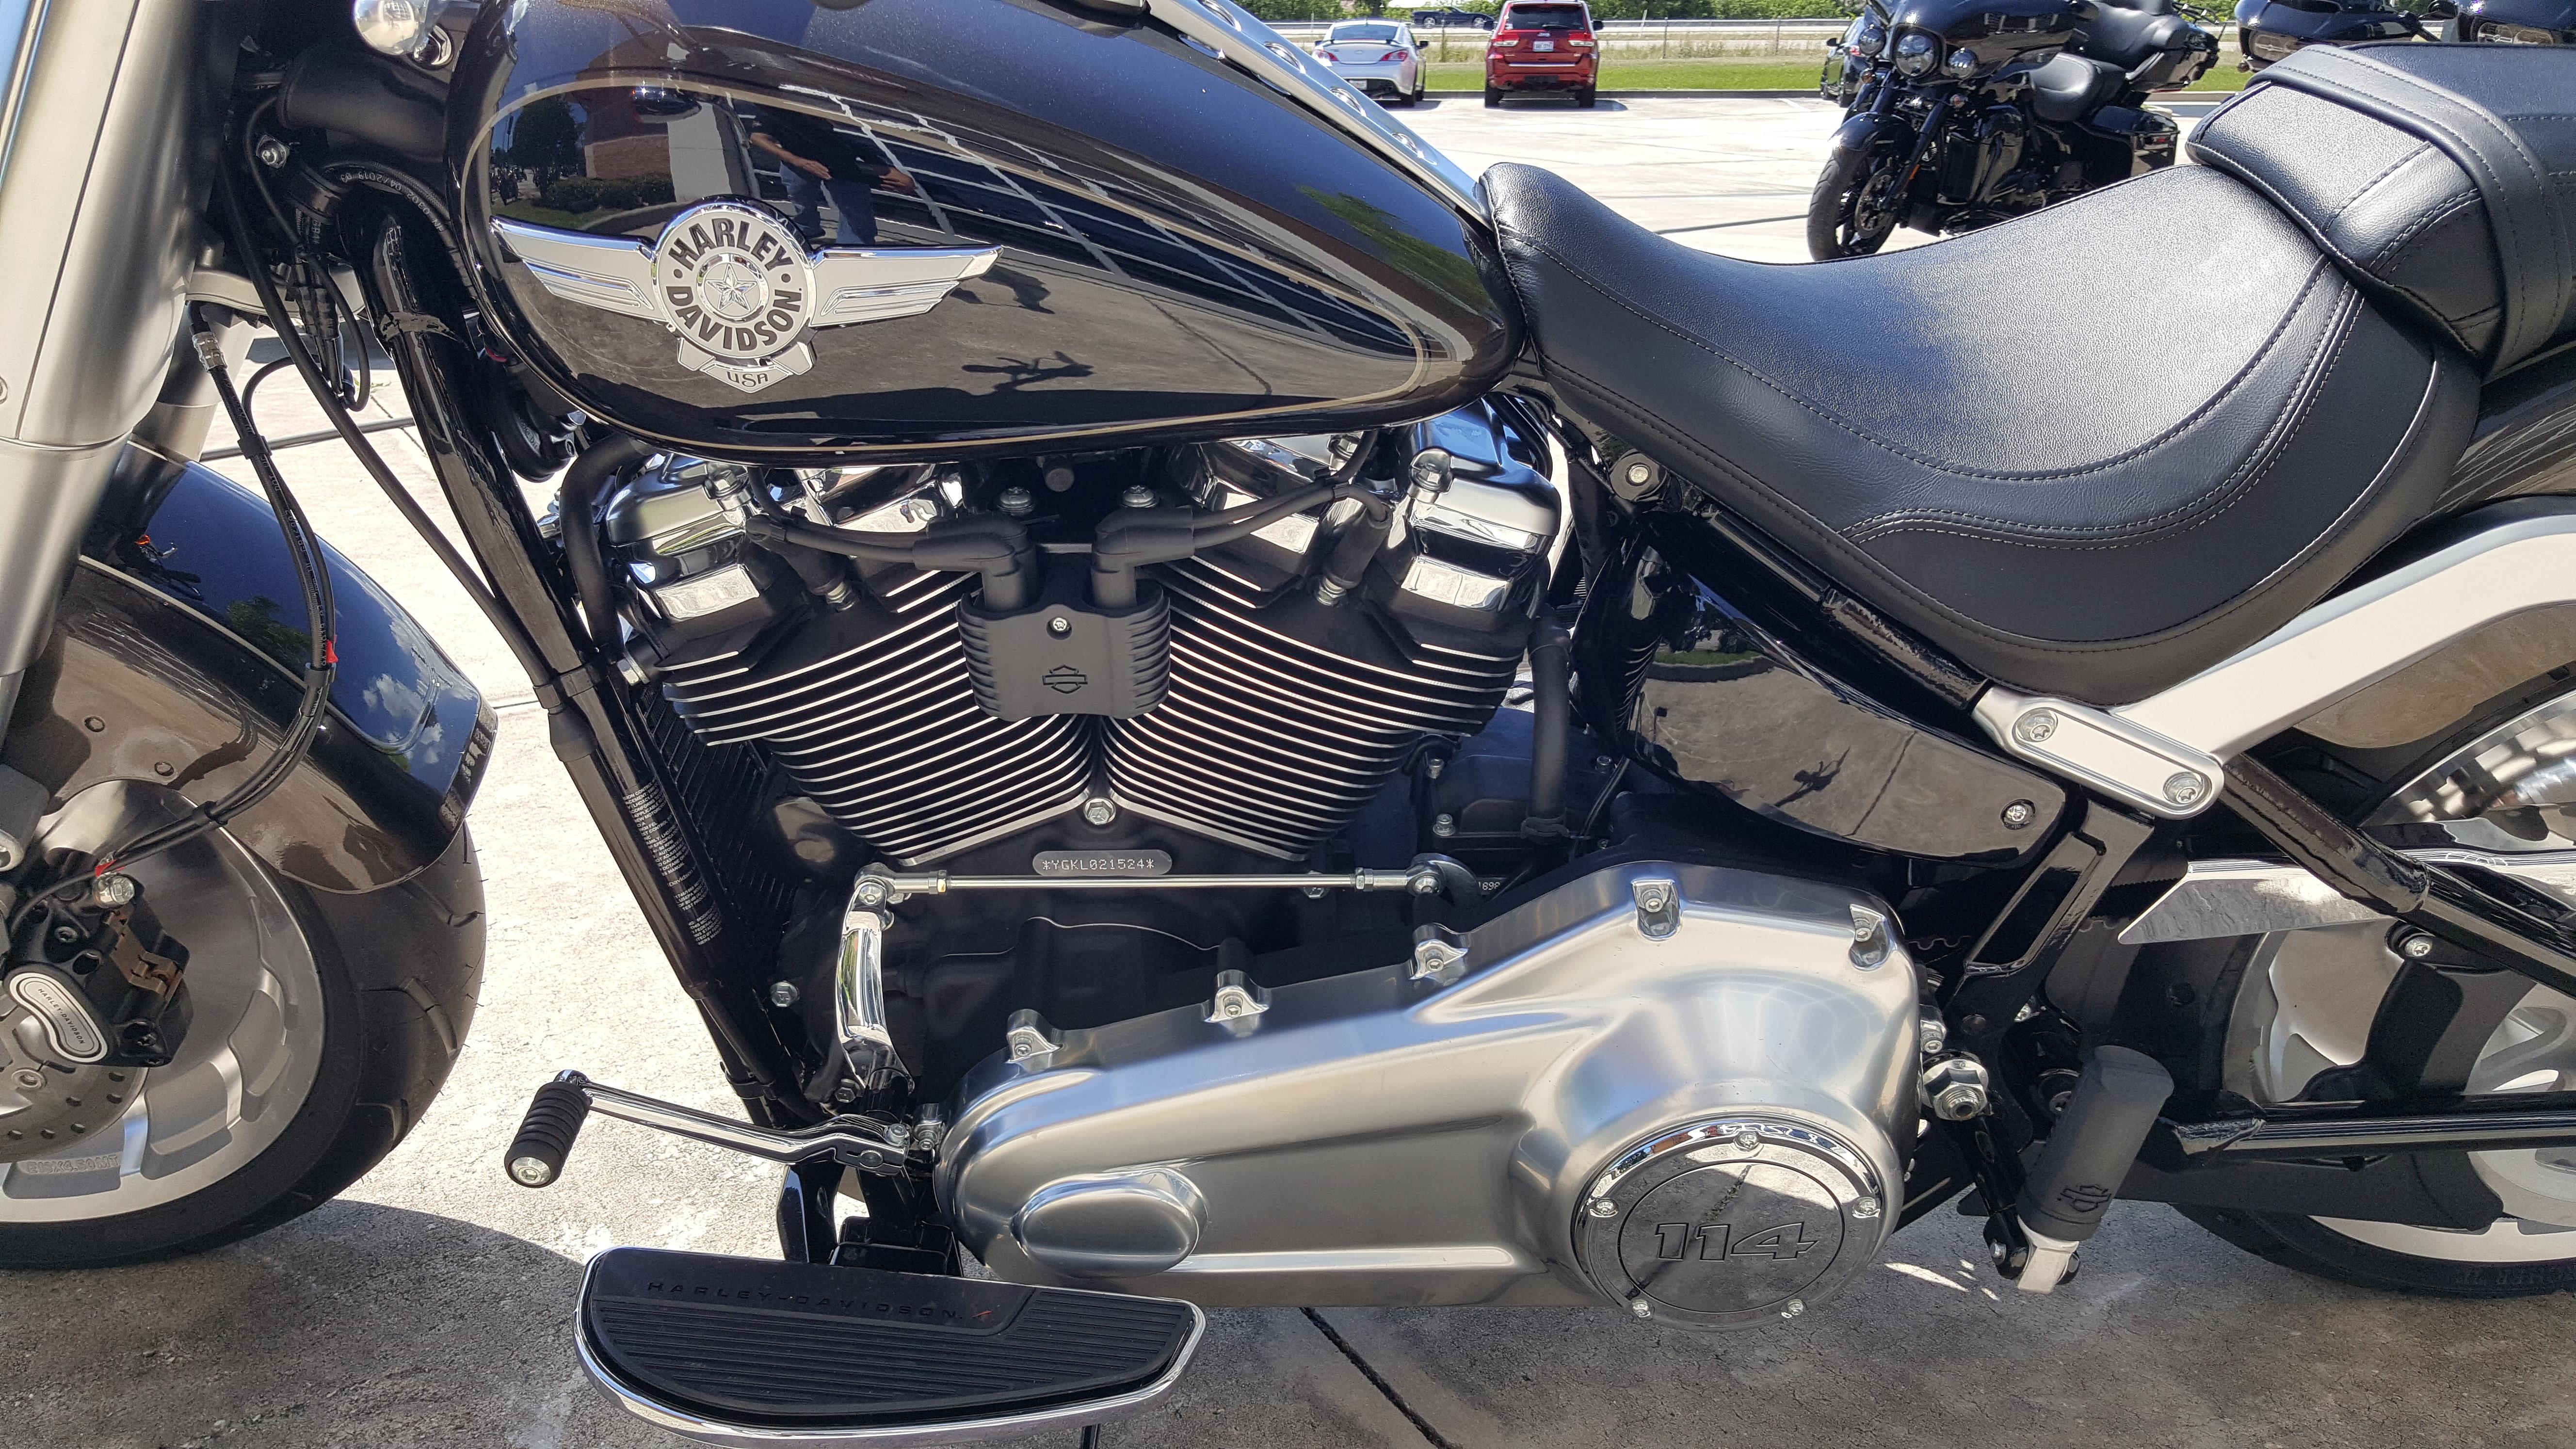 New 2020 Harley-Davidson Fat boy 114